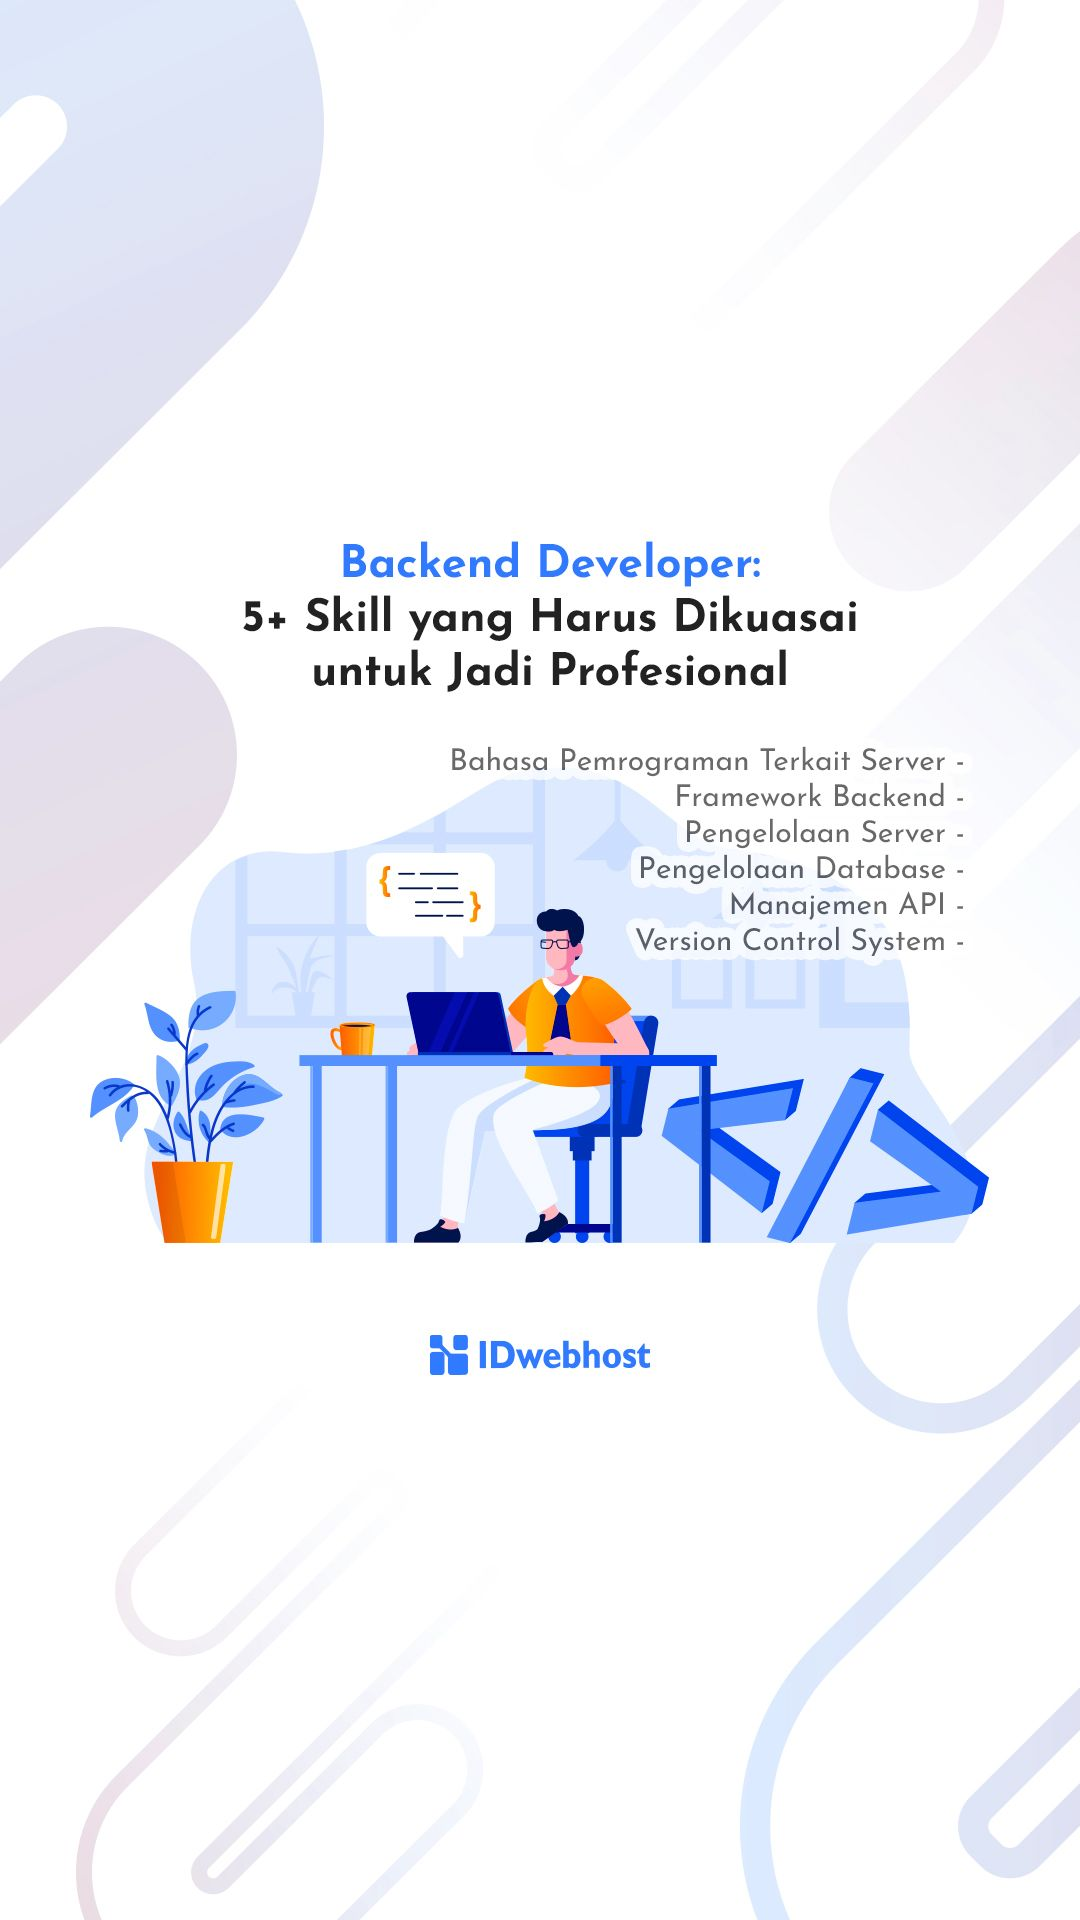 Skill Yang Harus Dikuasai Untuk Jadi Profesional Backend Developer Pemrograman Website Bahasa